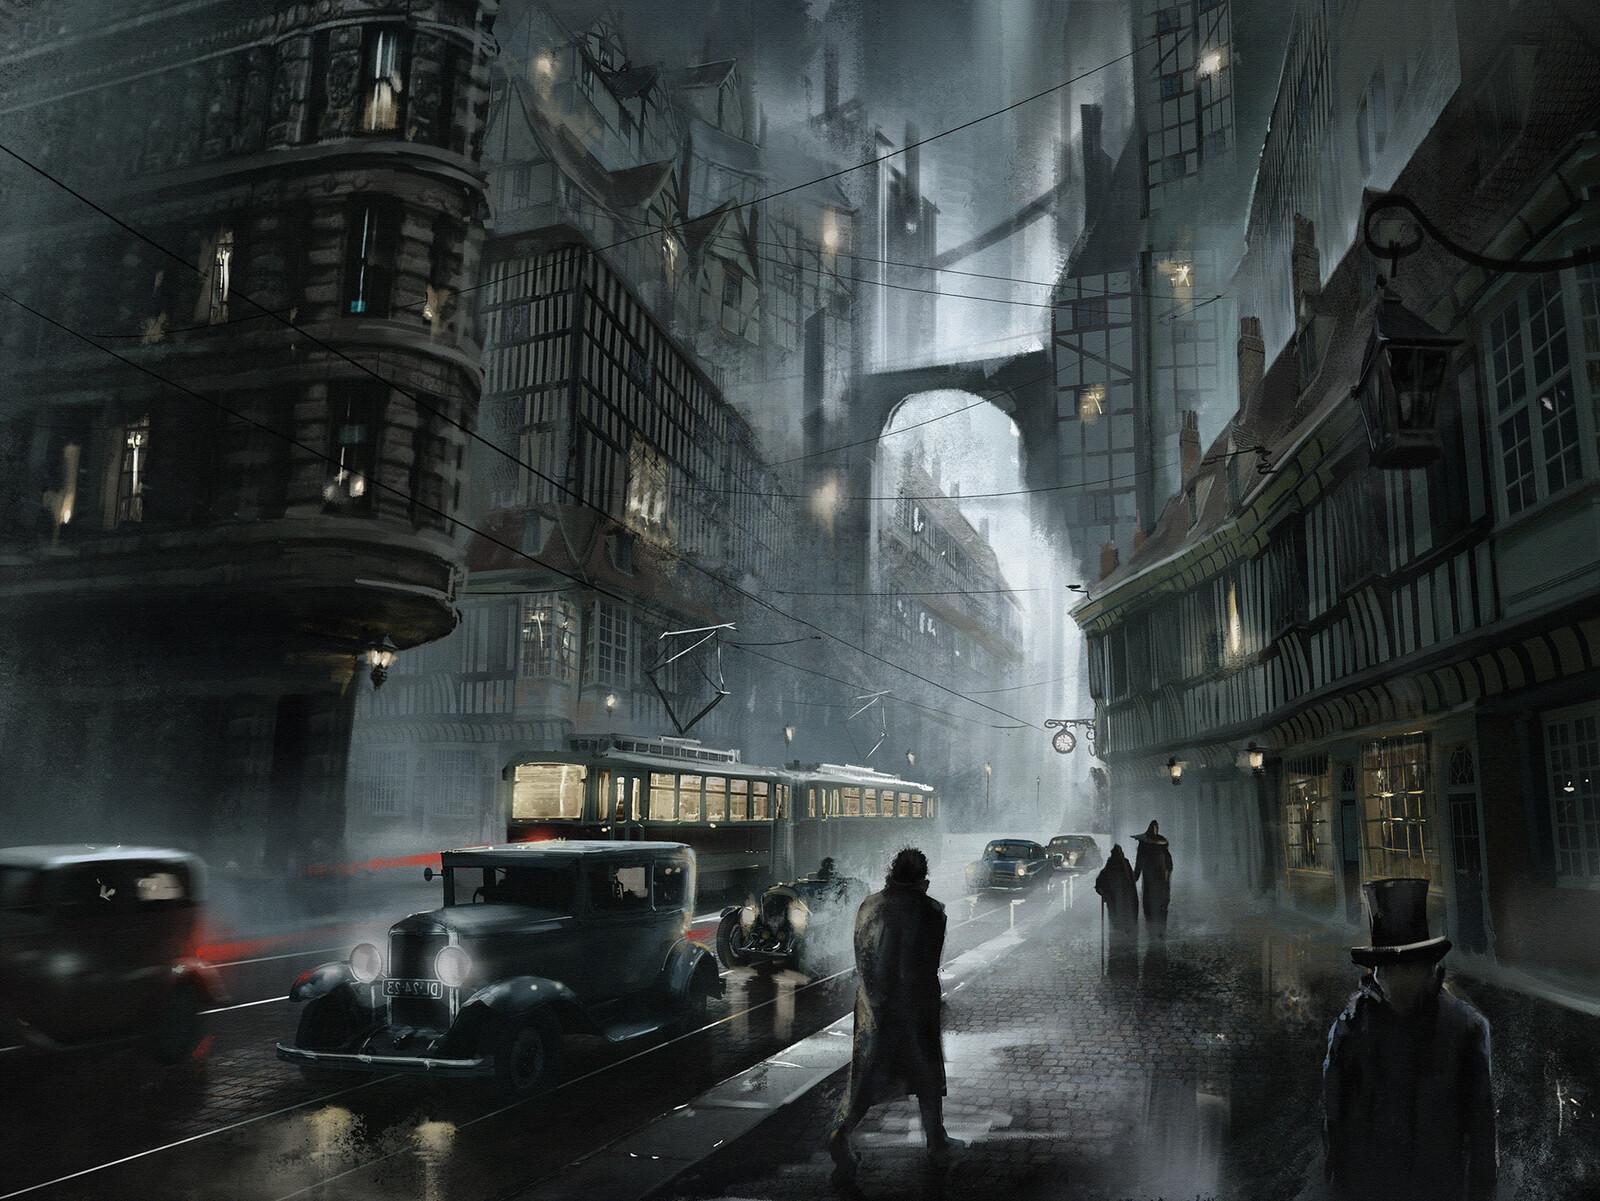 Dark Moody Street